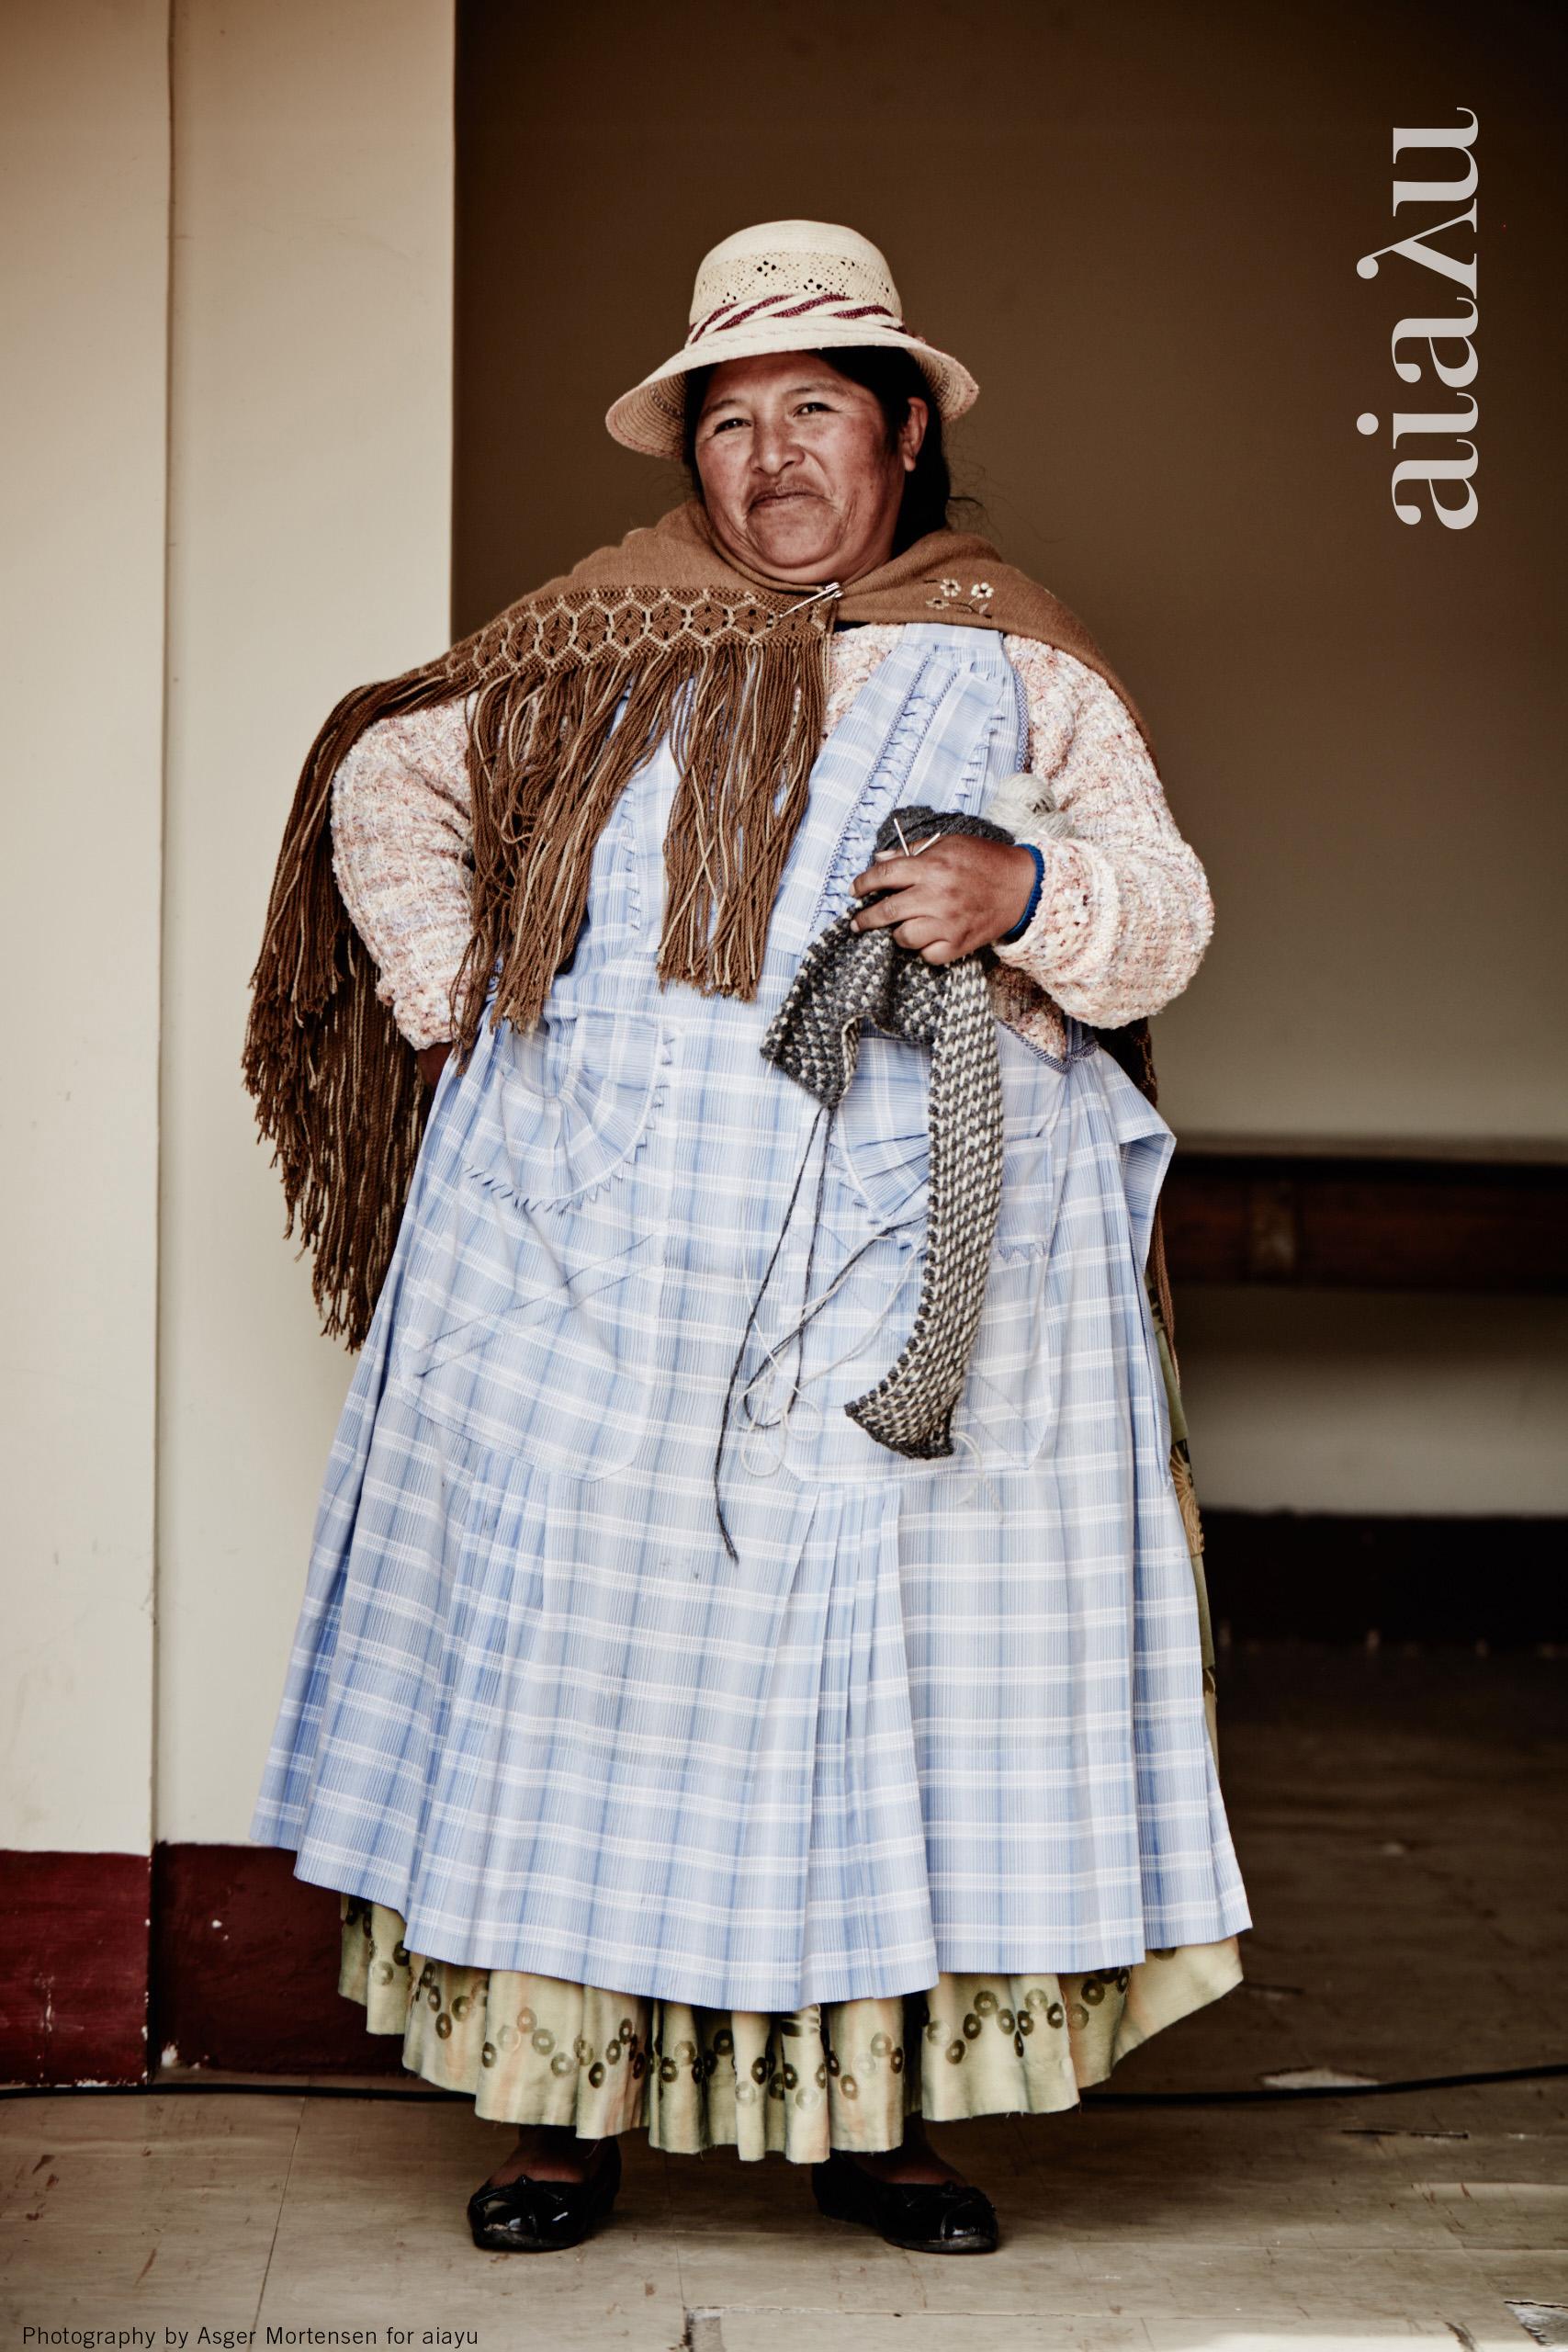 Handknitter, Bolivia